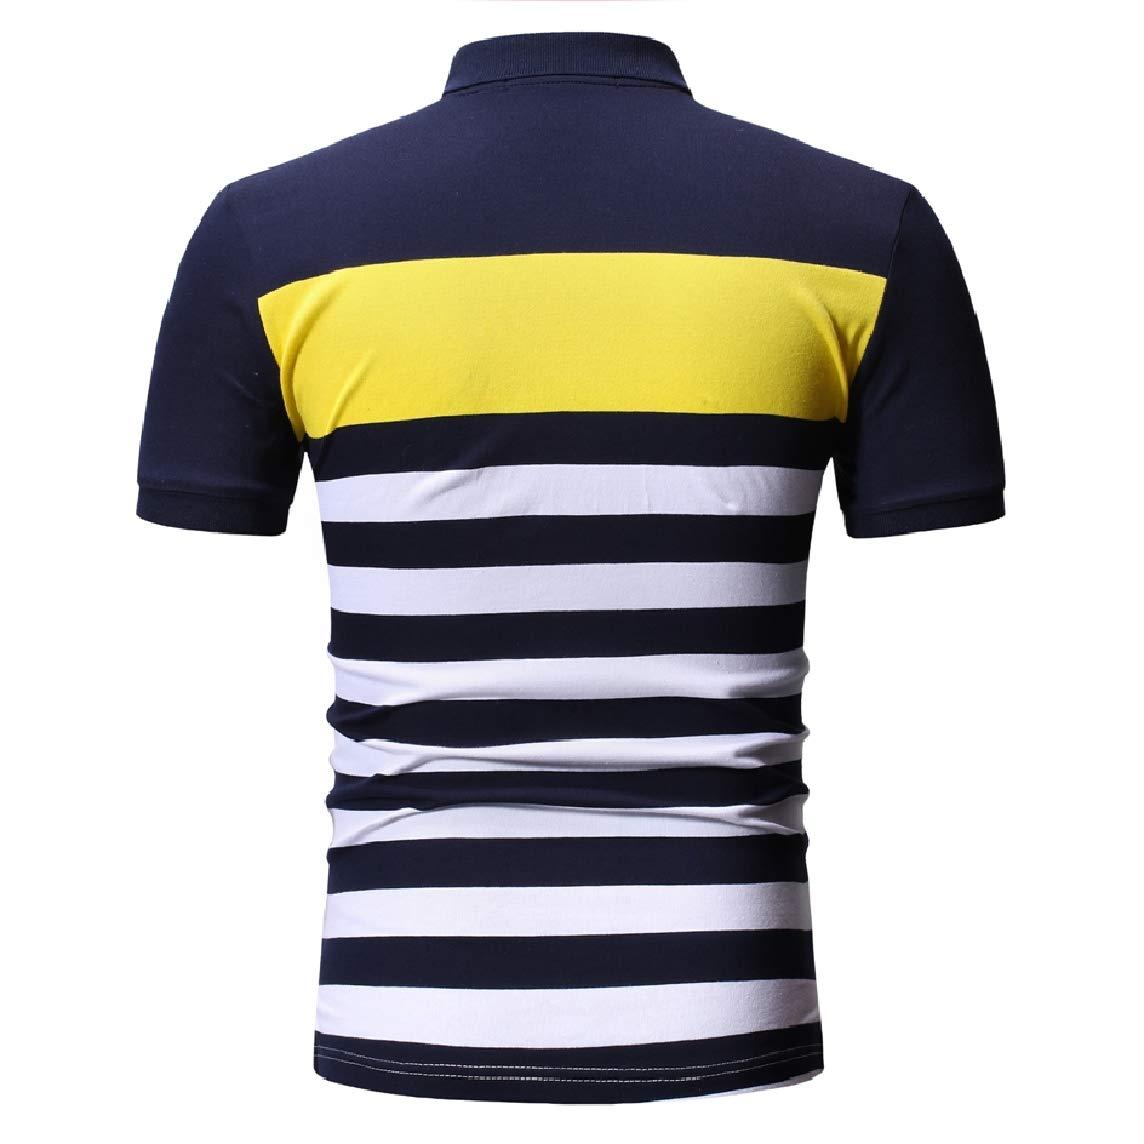 Mfasica Men Lapel Cozy Short-Sleeve Hit Color T-Shirts Polo Shirt